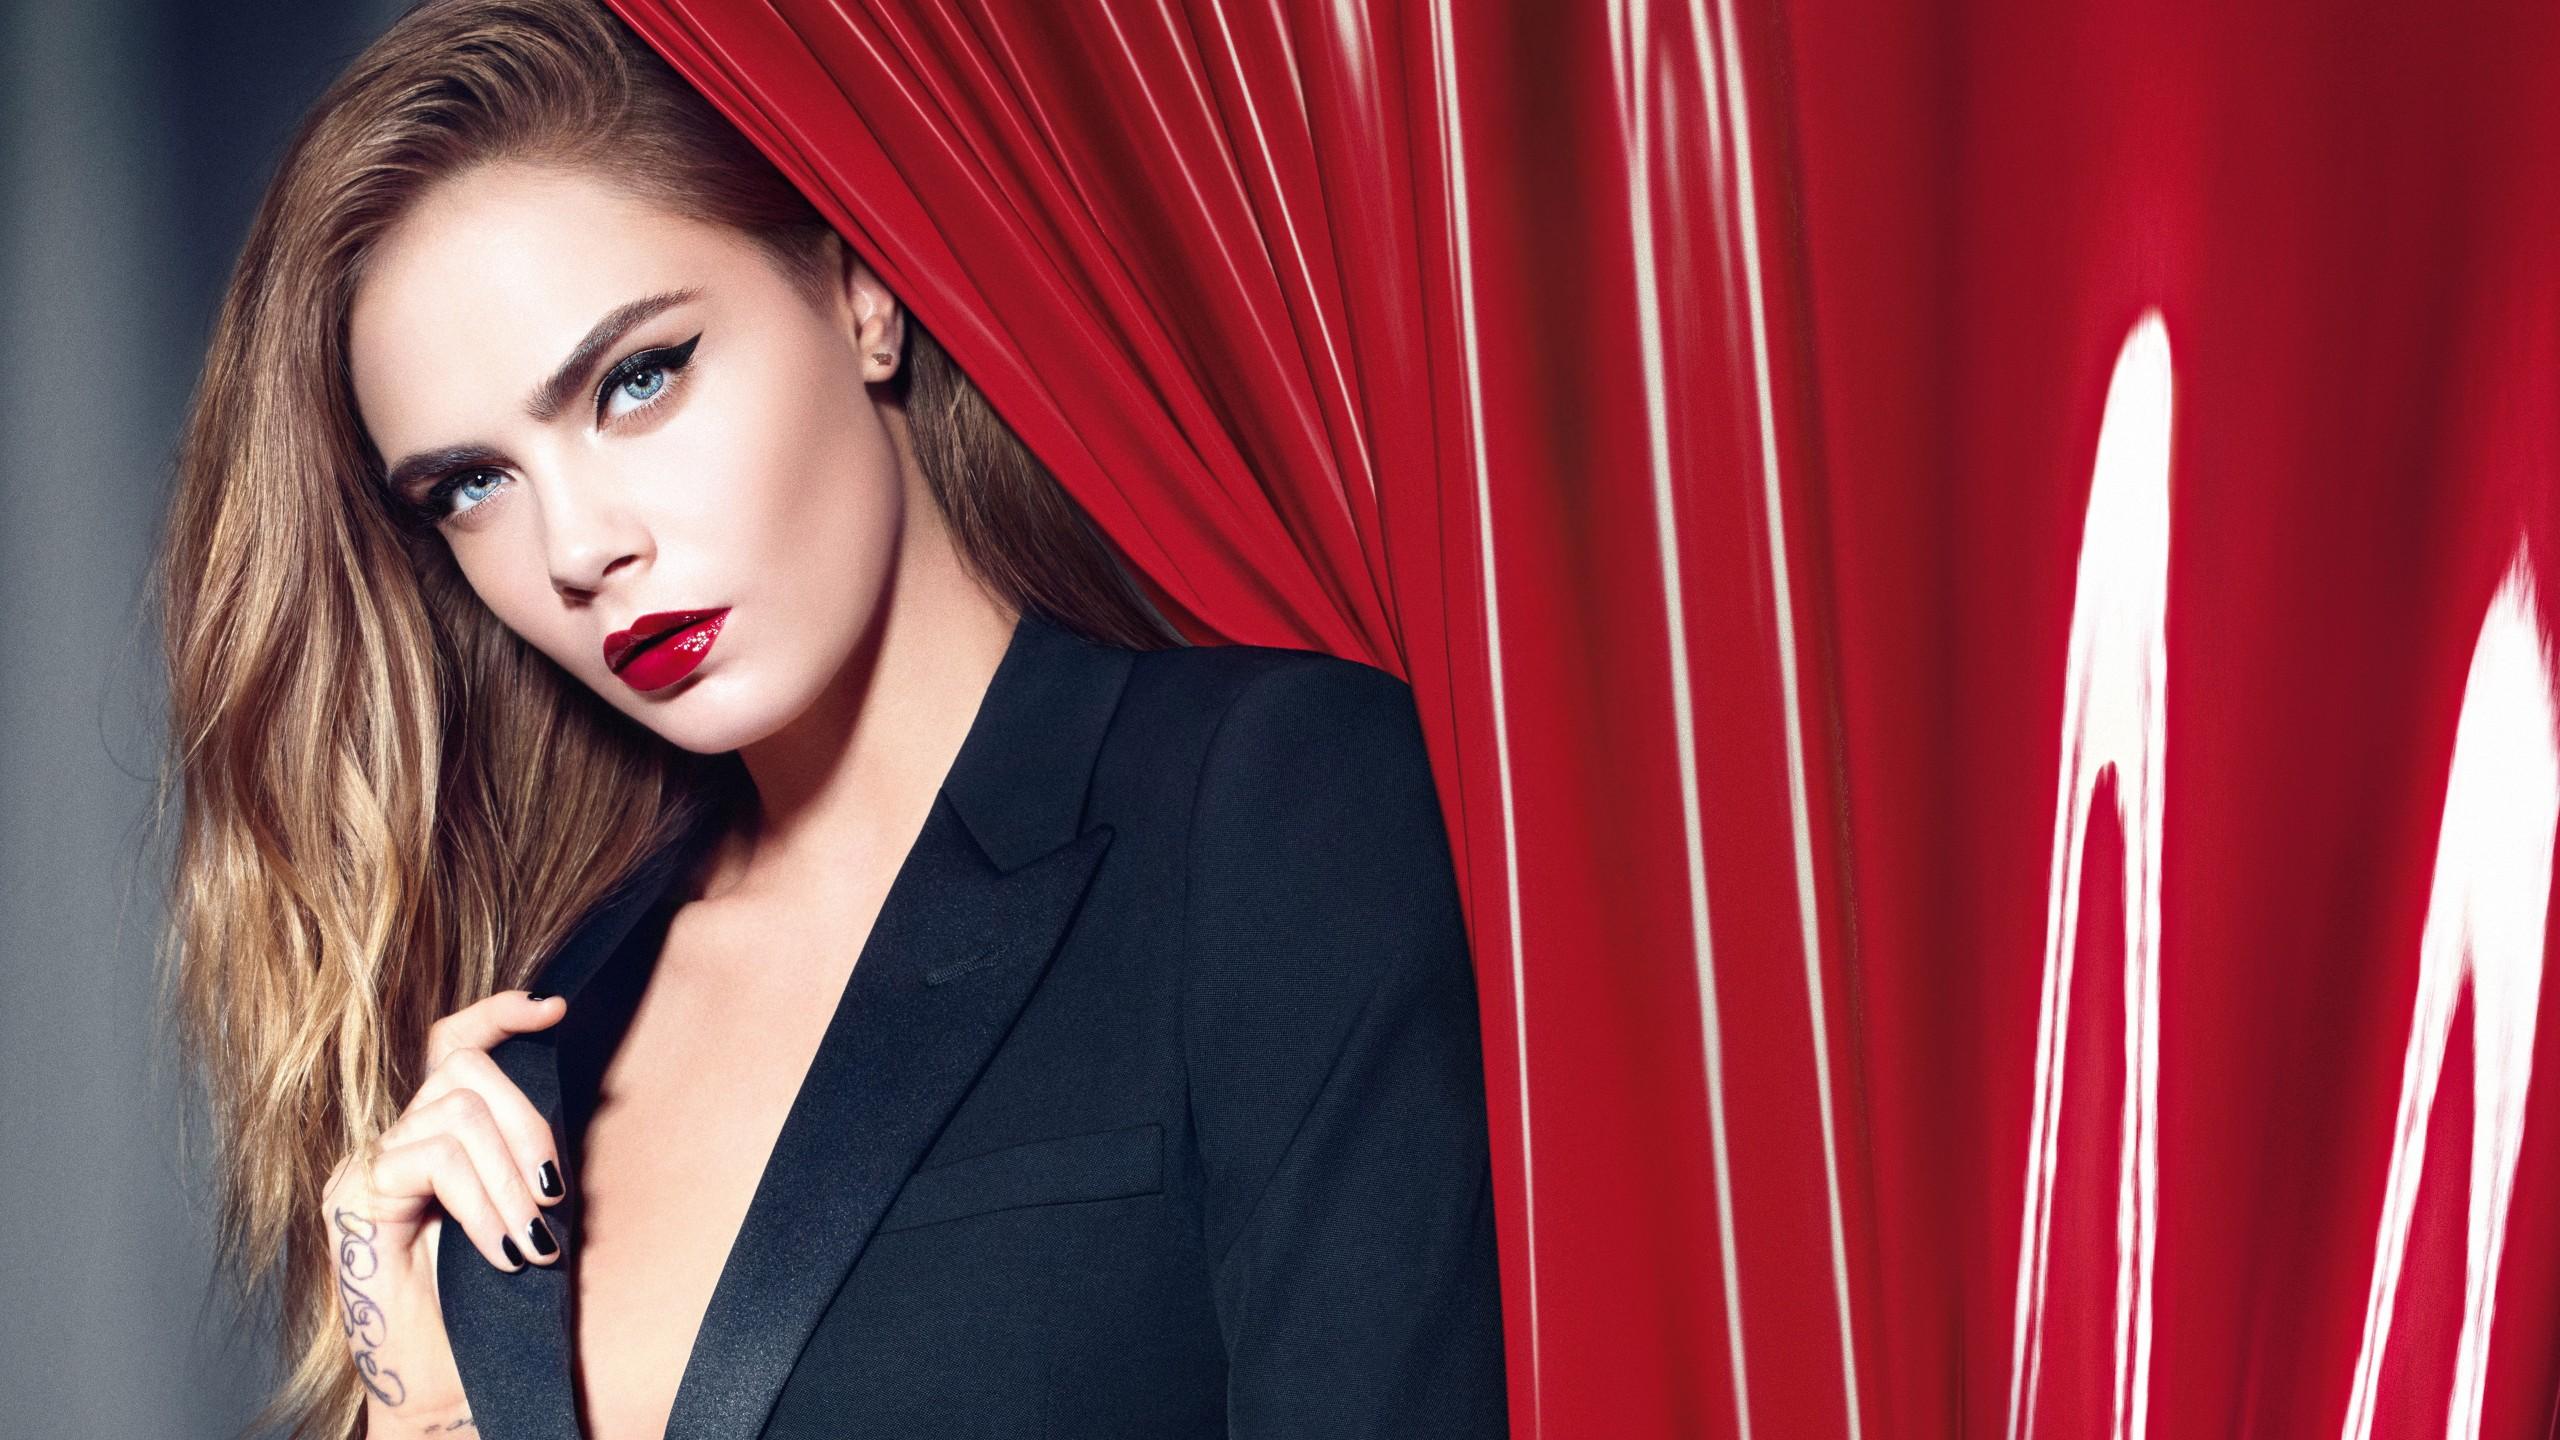 Wallpaper Cara Delevingne, Top Fashion Models, Model